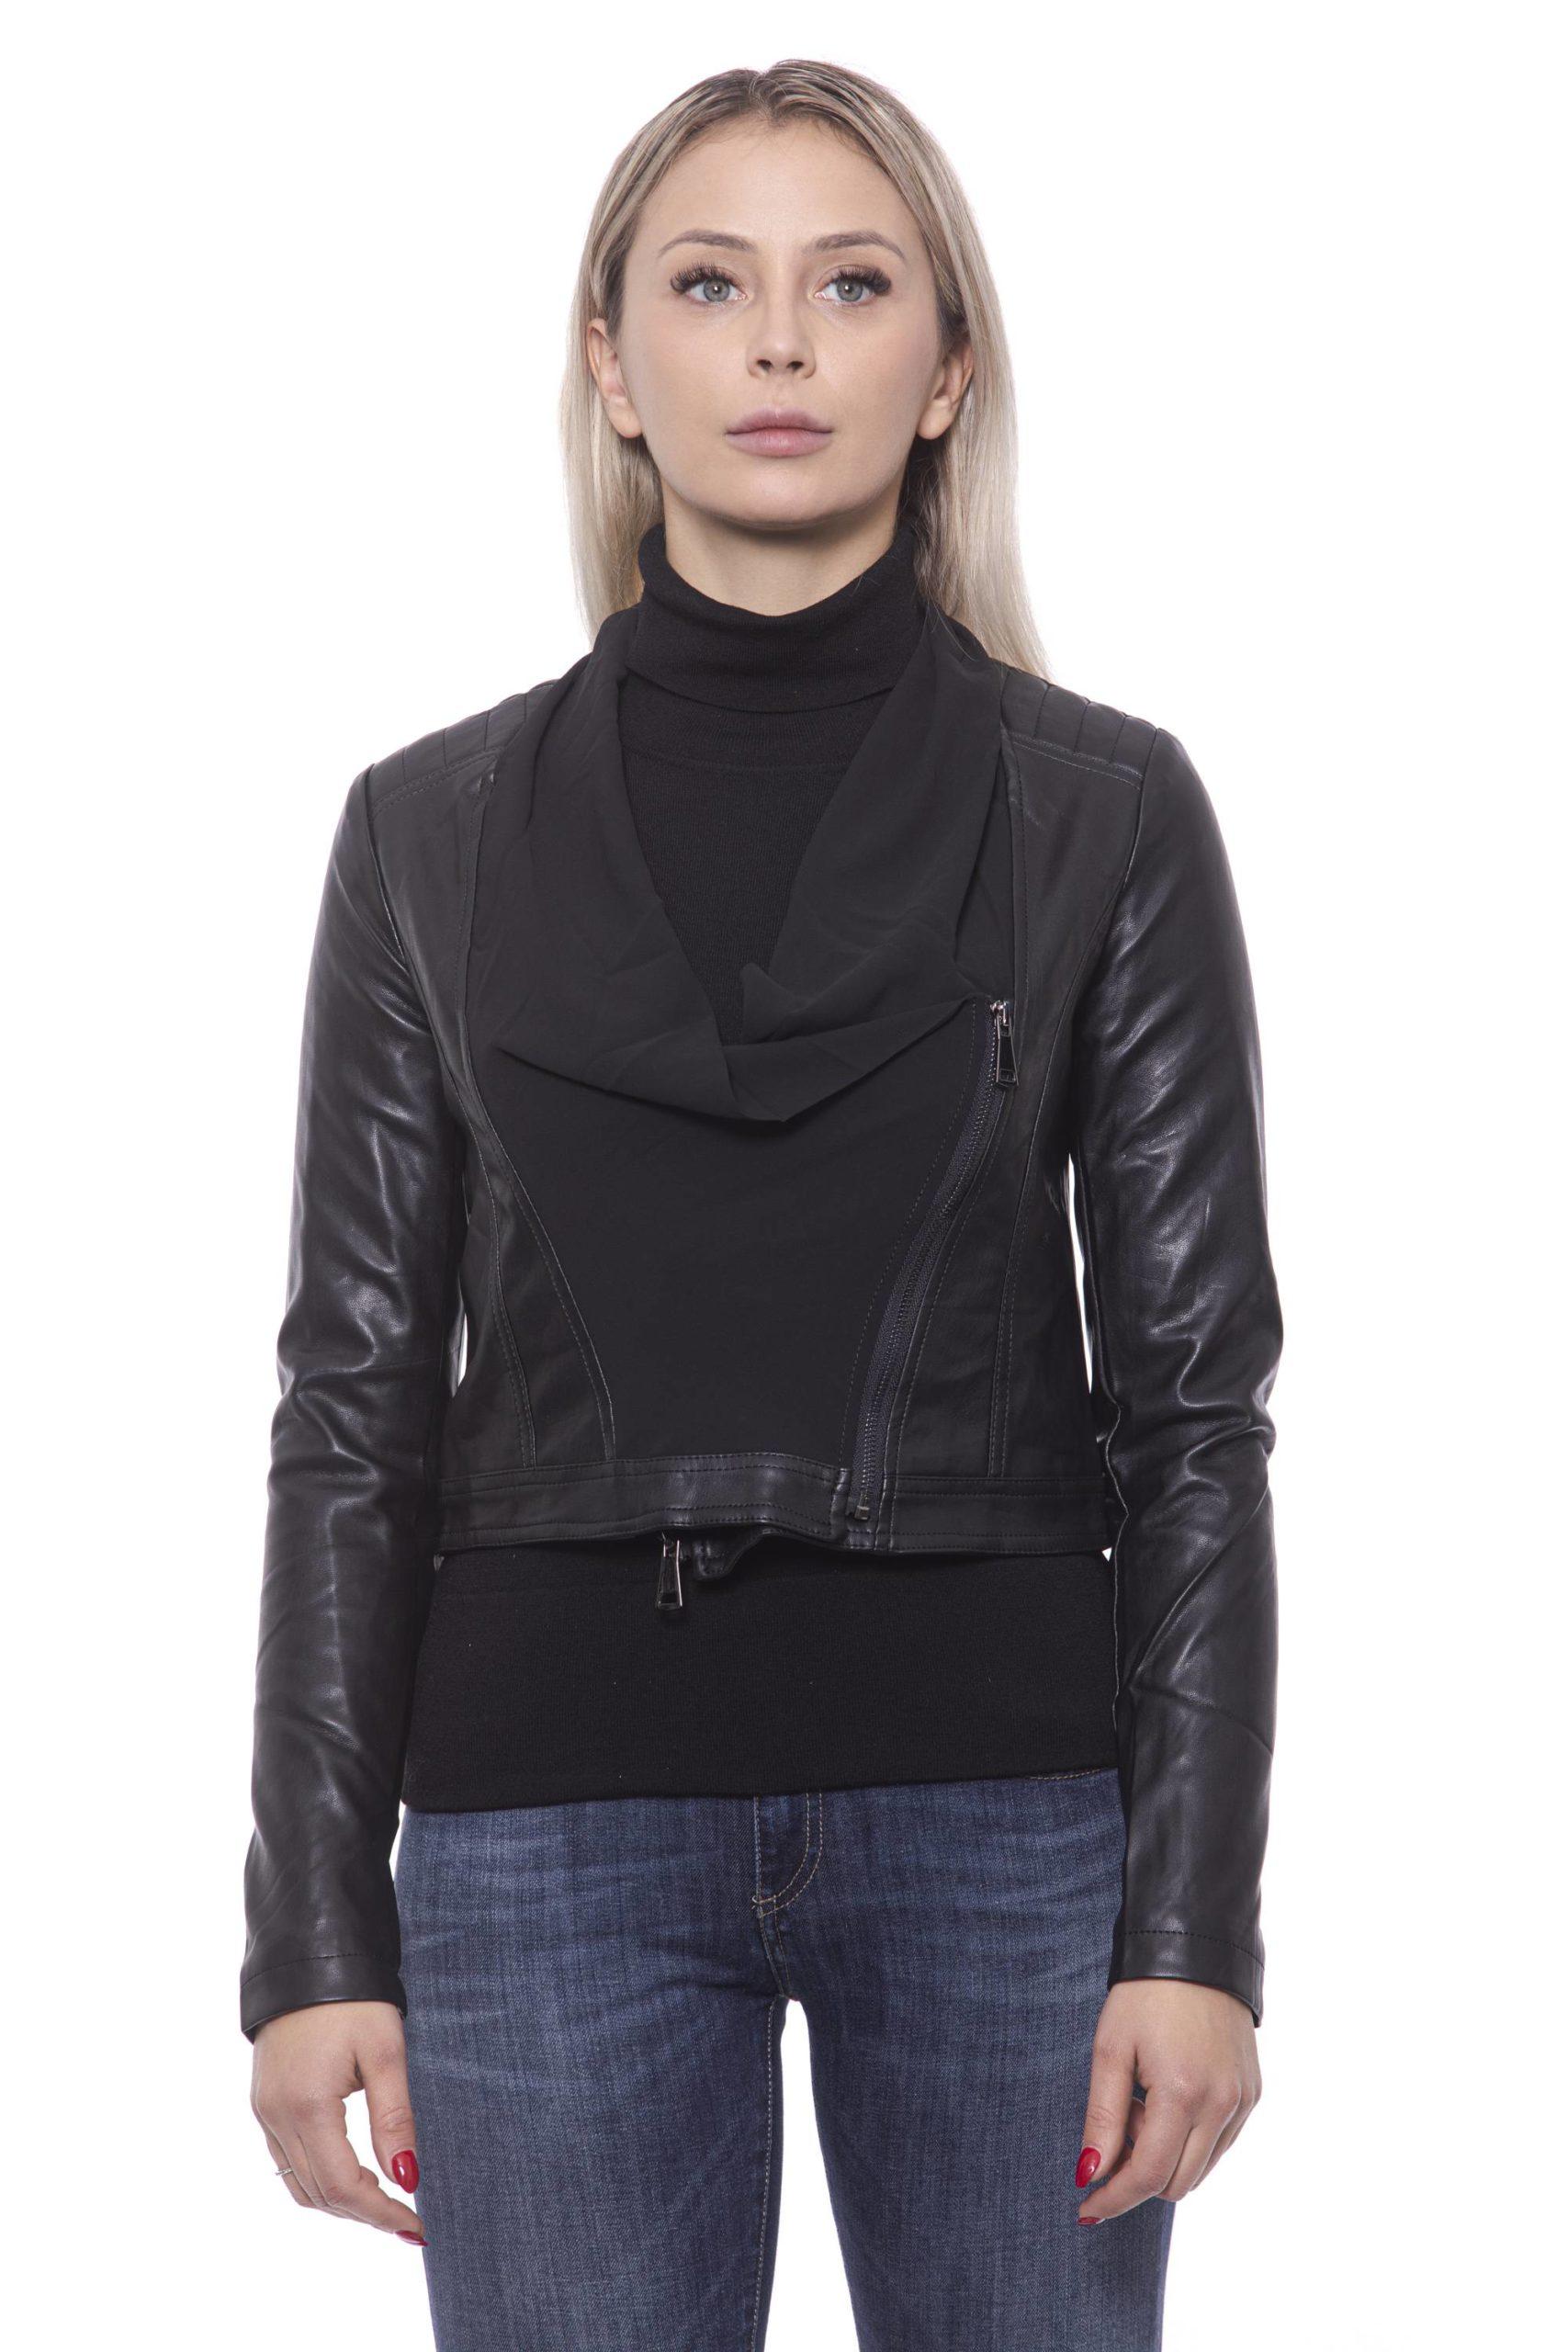 19V69 Italia Women's Nero Jacket 191388439 - M